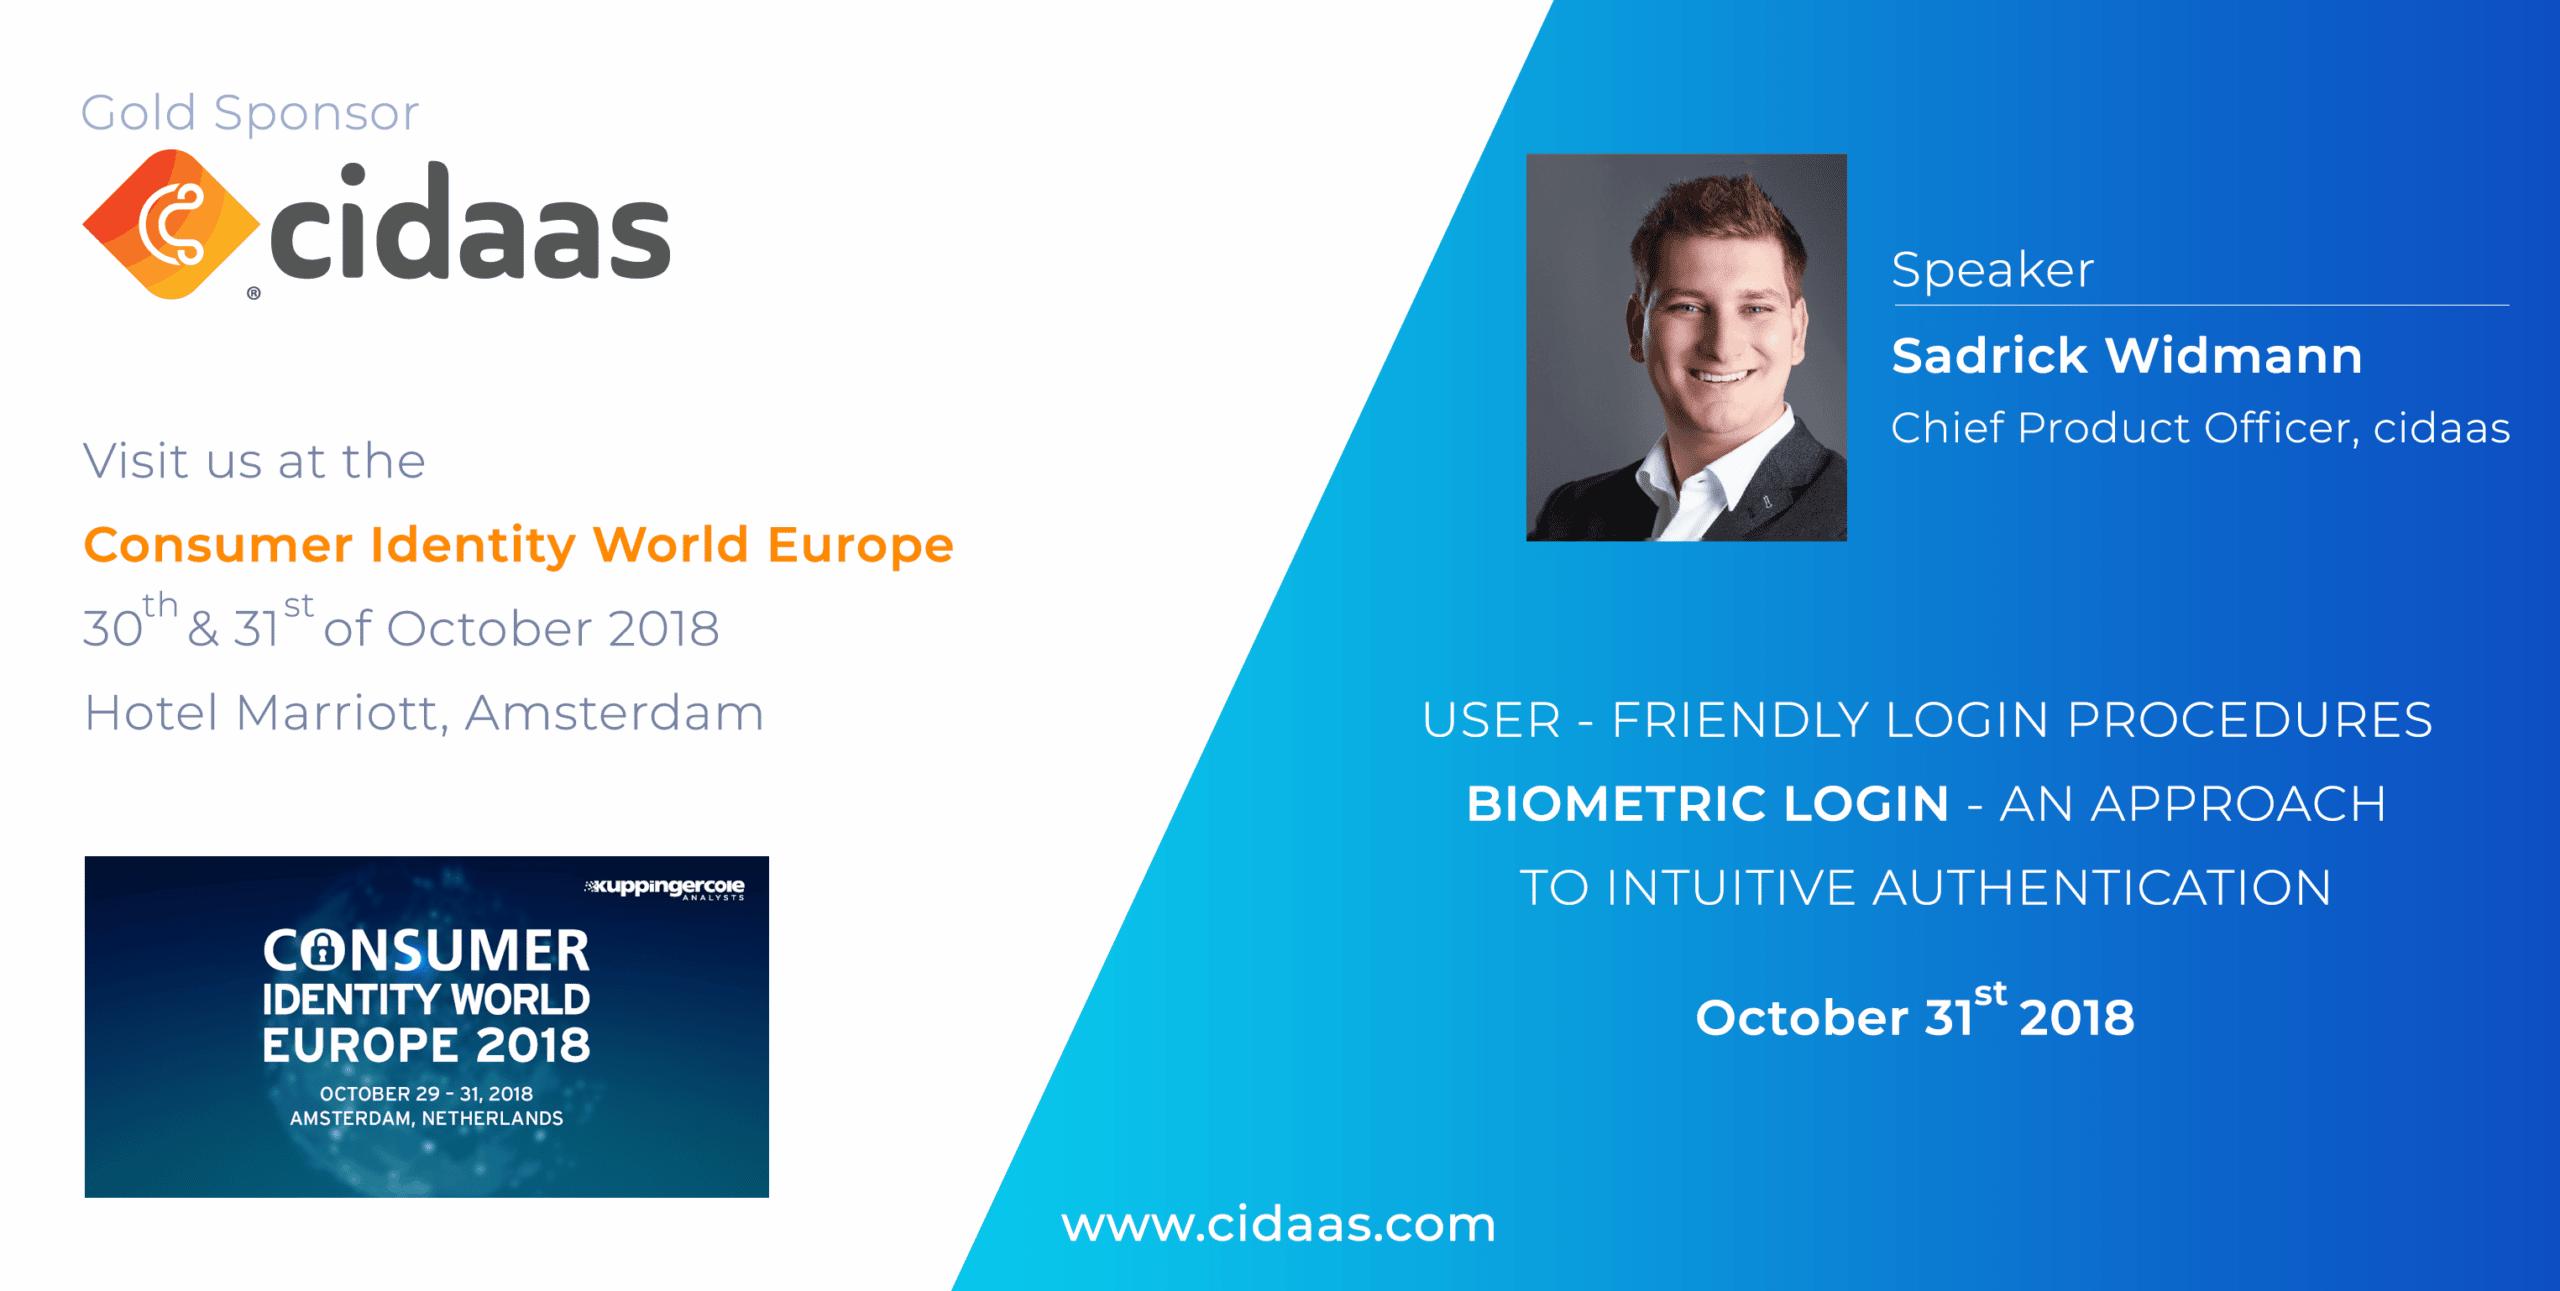 Consumer identity world EUROPE 2018